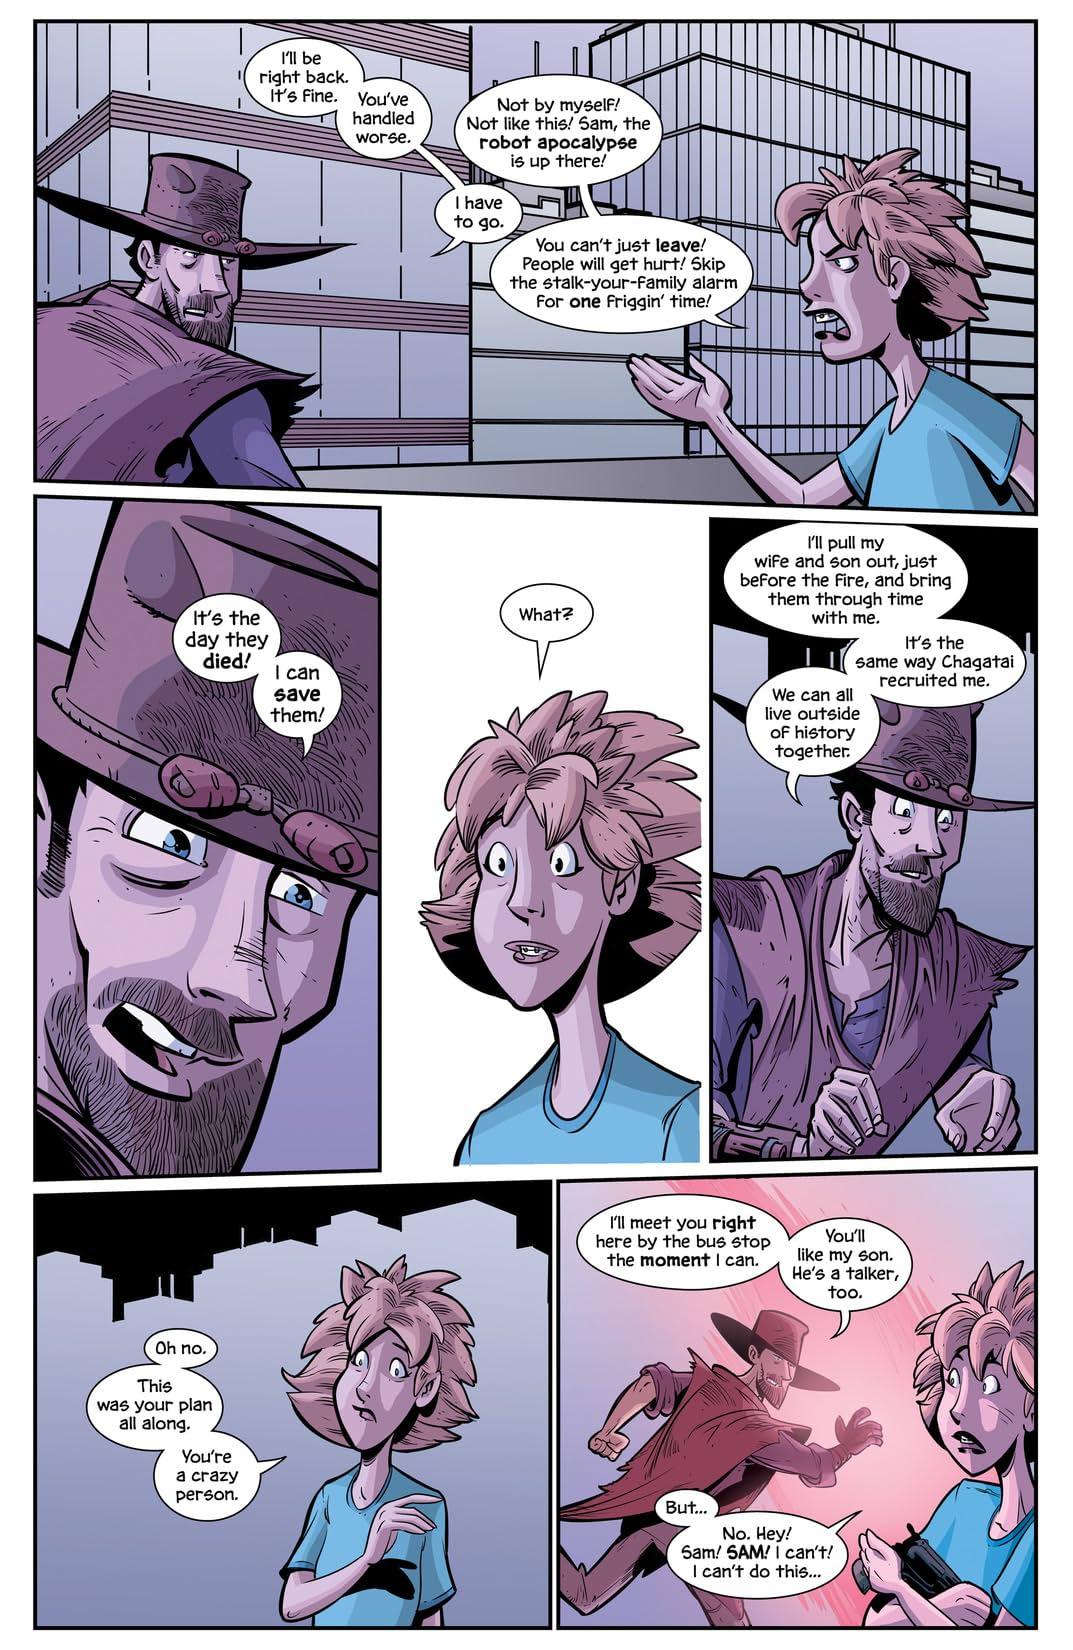 Agents of Paradox #3